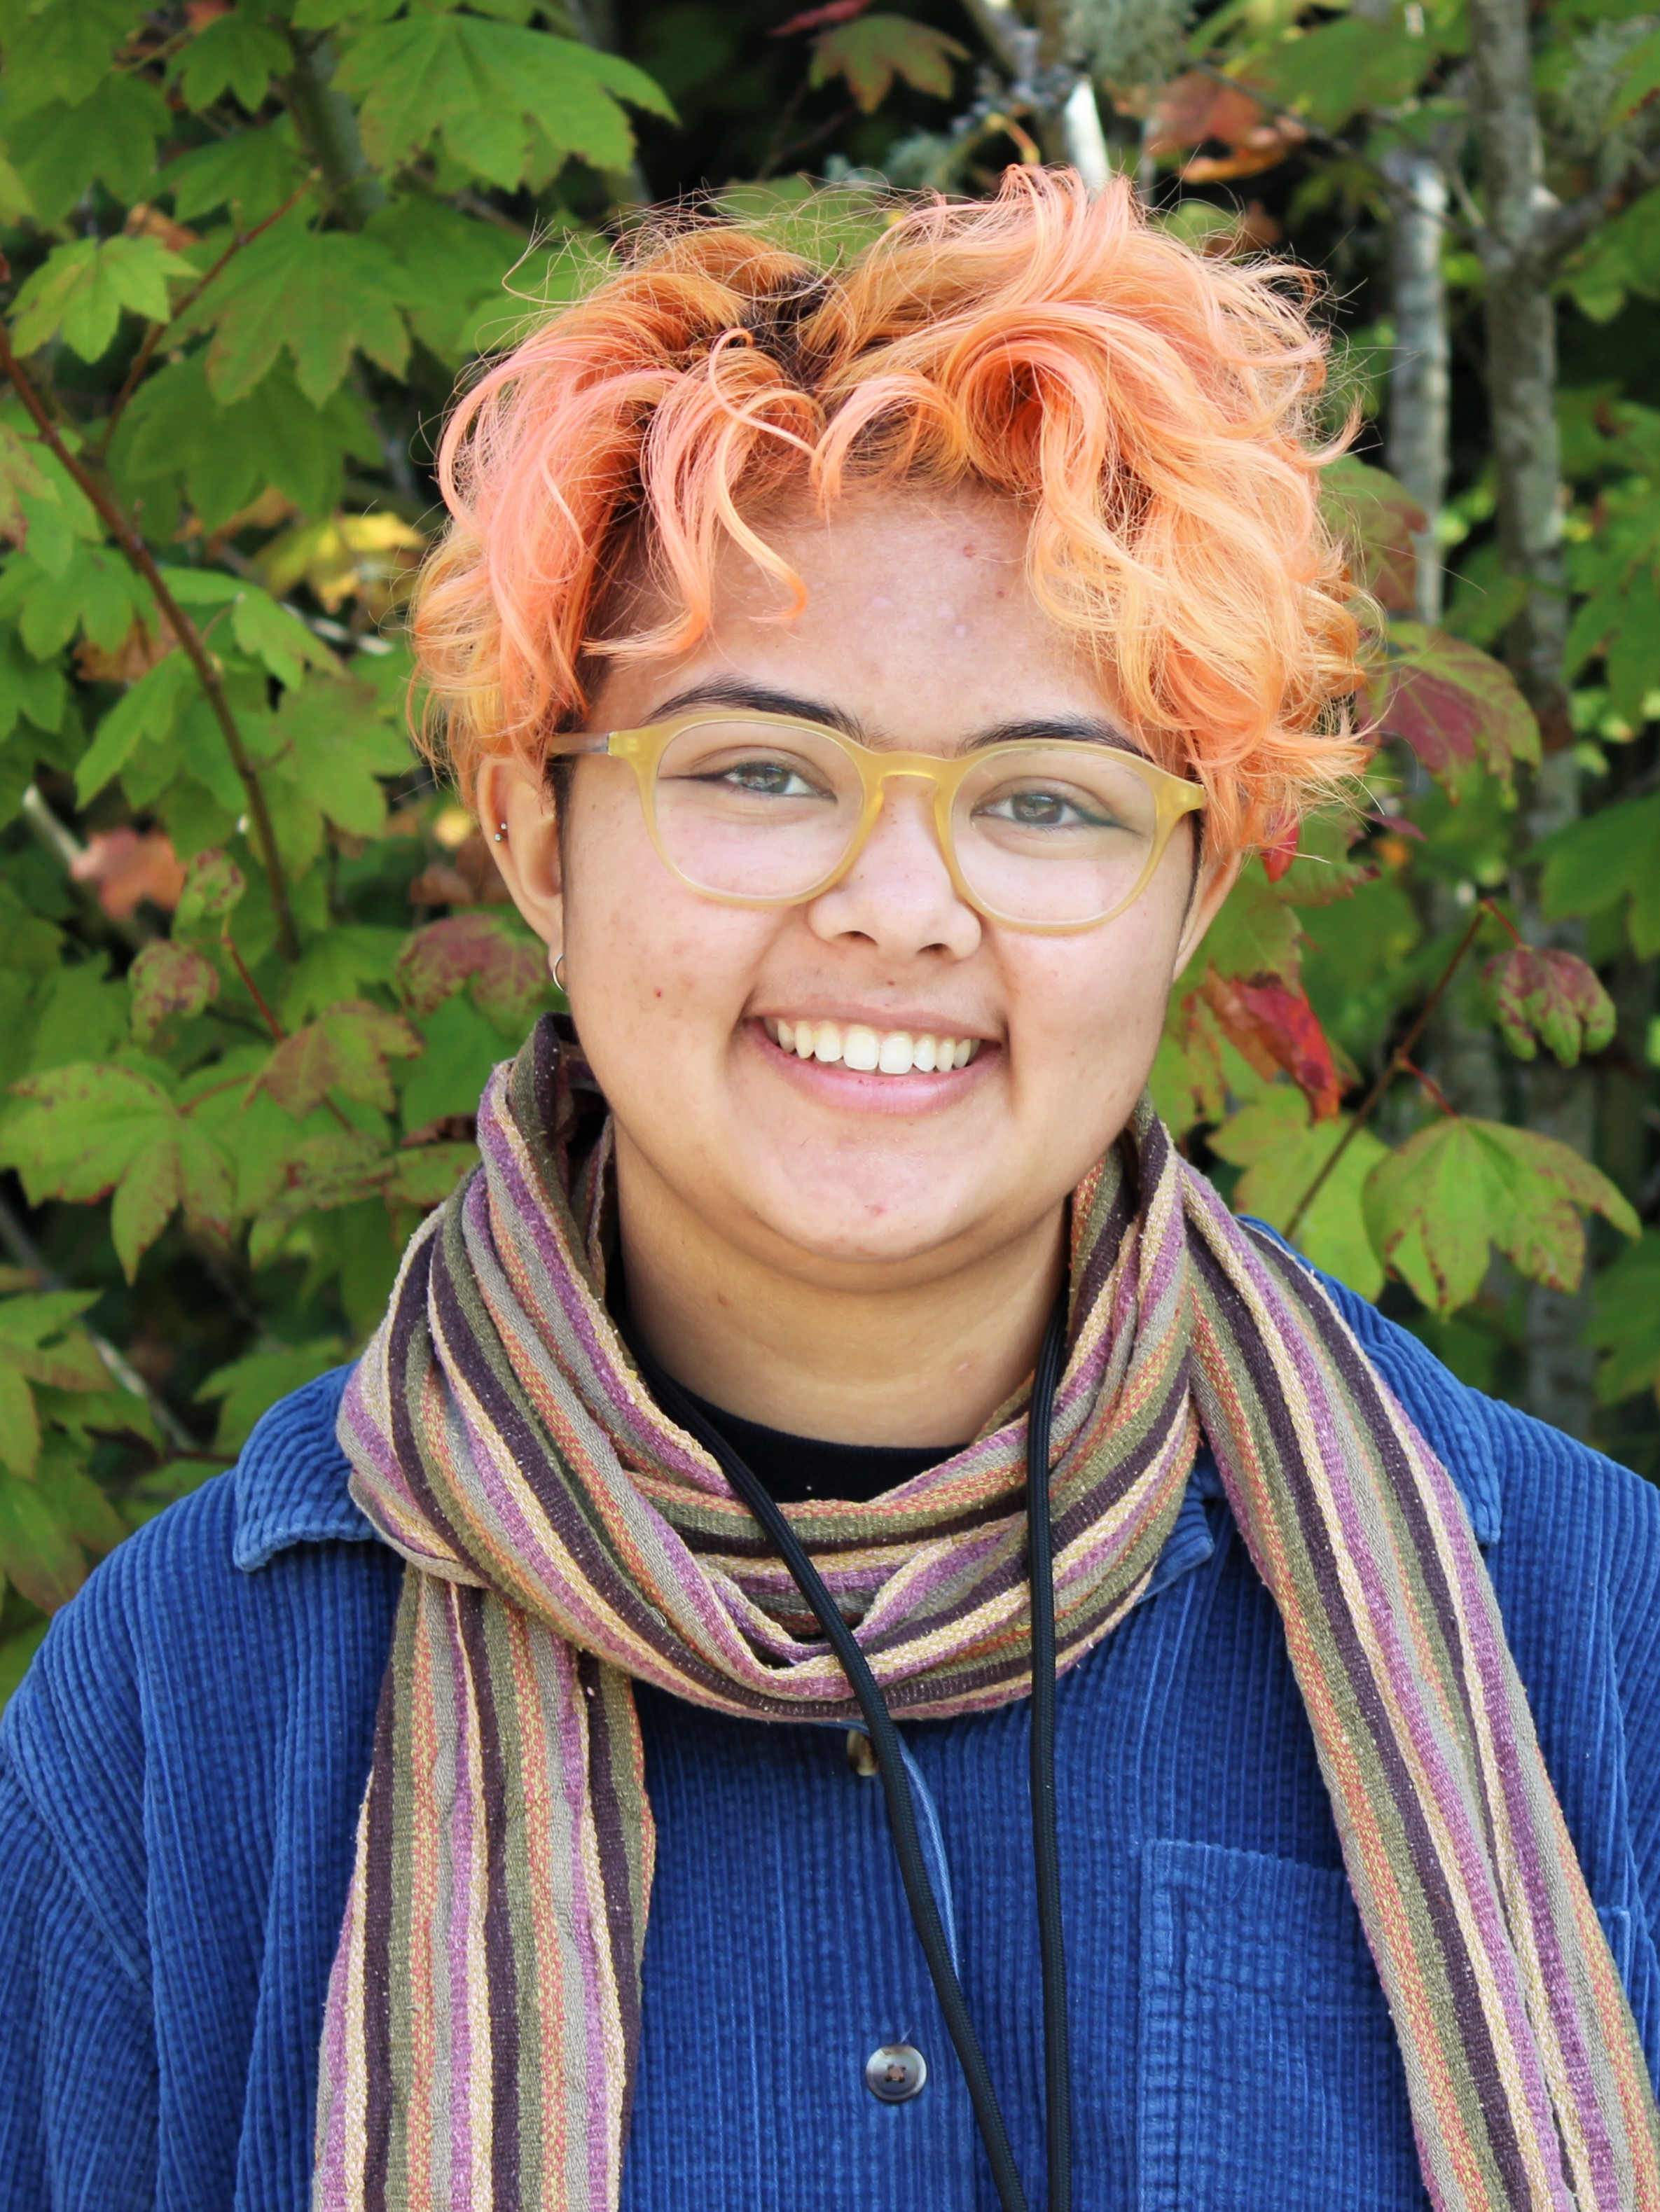 IslandWood Graduate Program student Meryl Haque